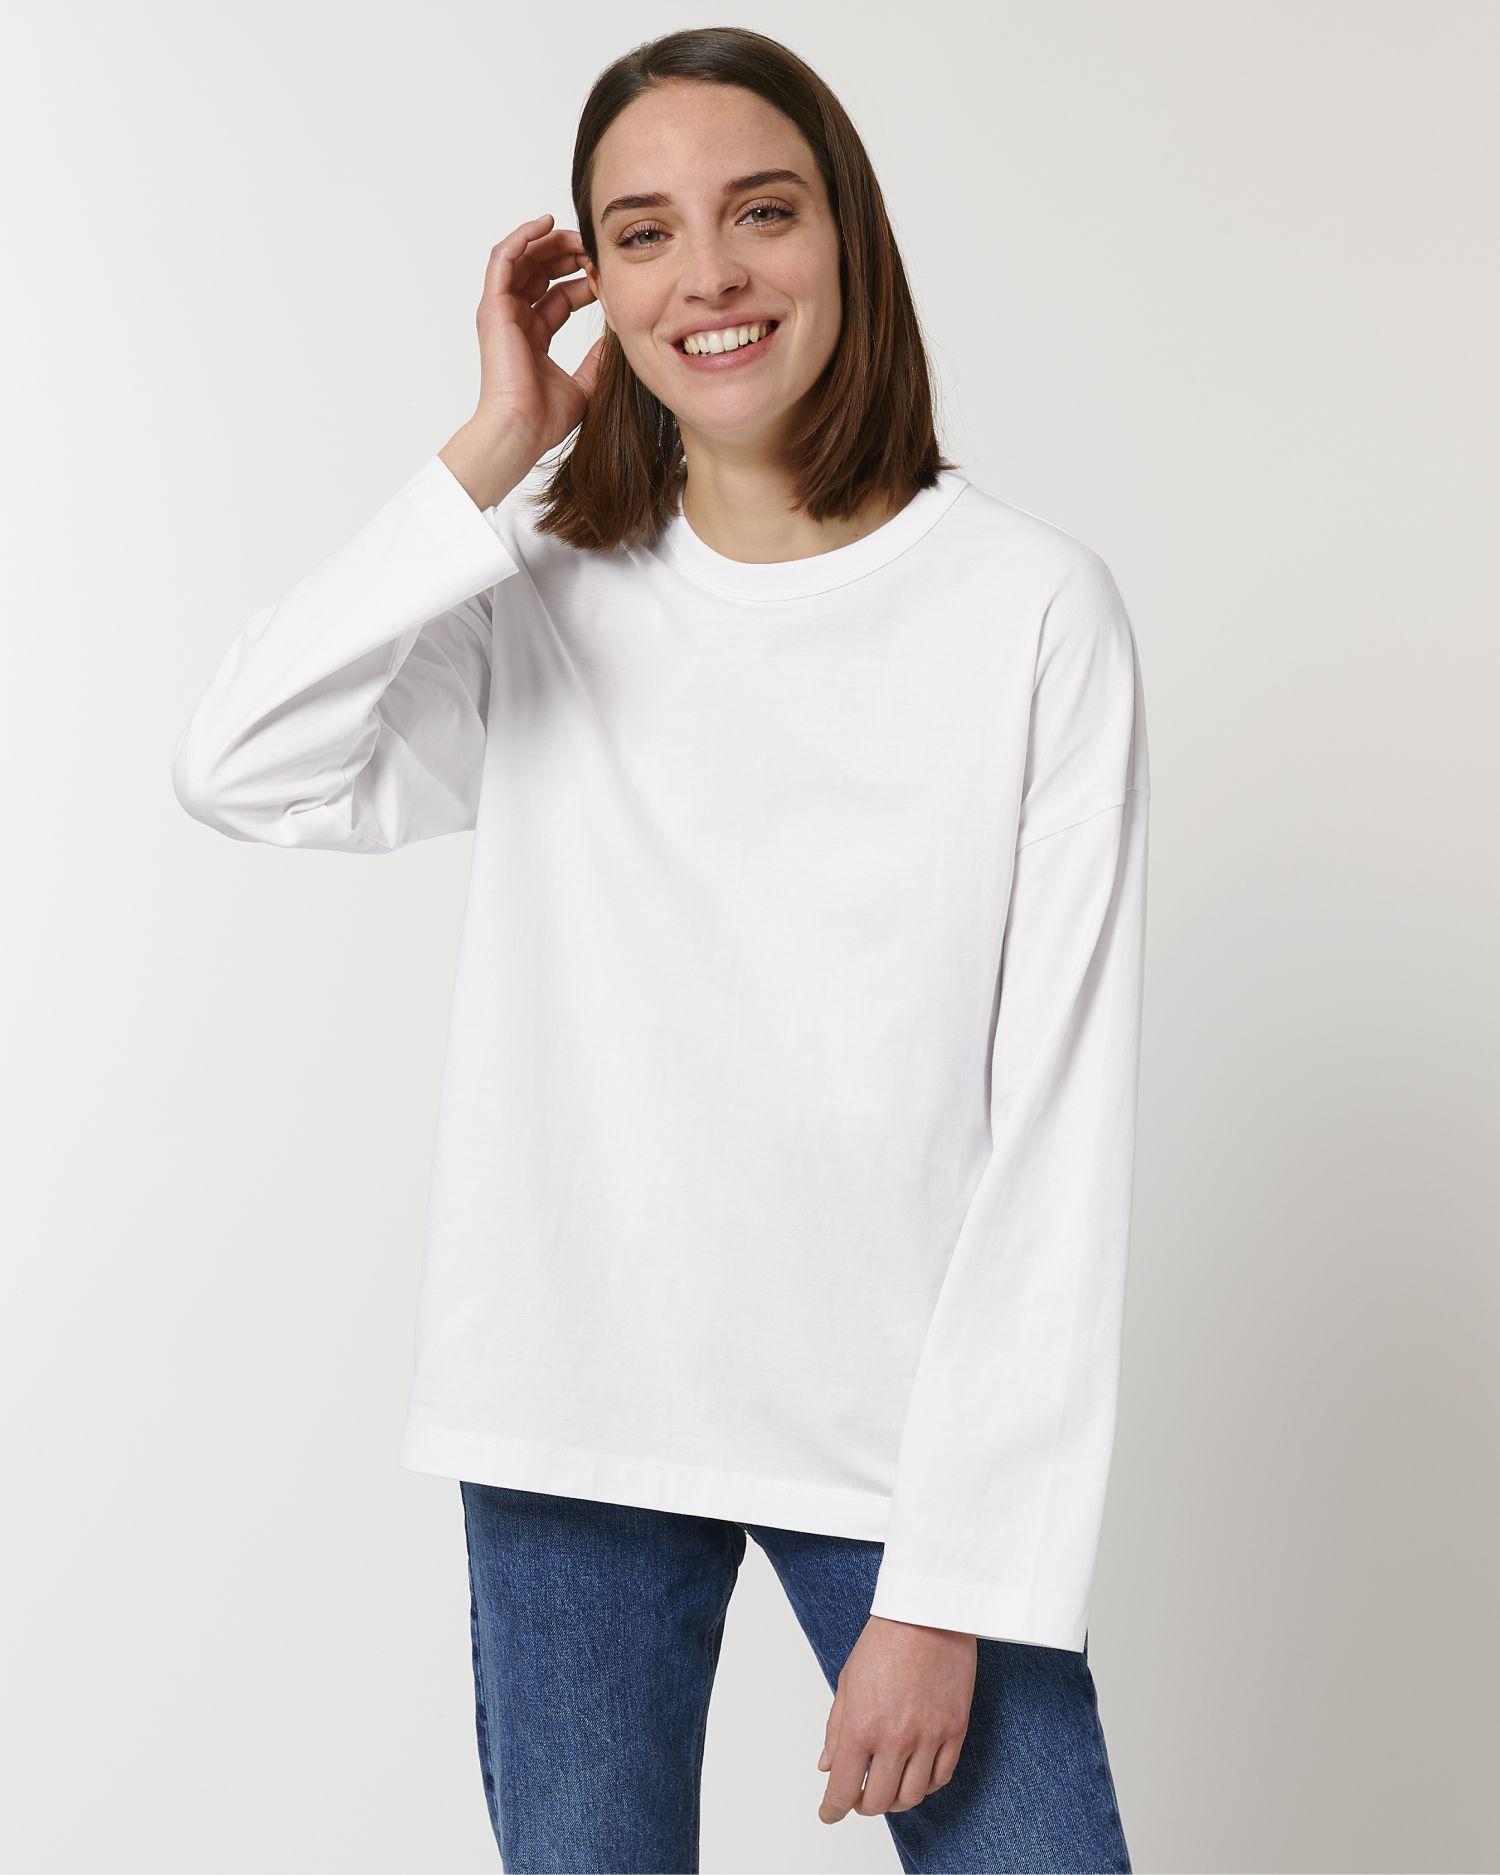 Triber Unisex Oversized Long Sleeve T-Shirt STTU790 Stanley/Stella